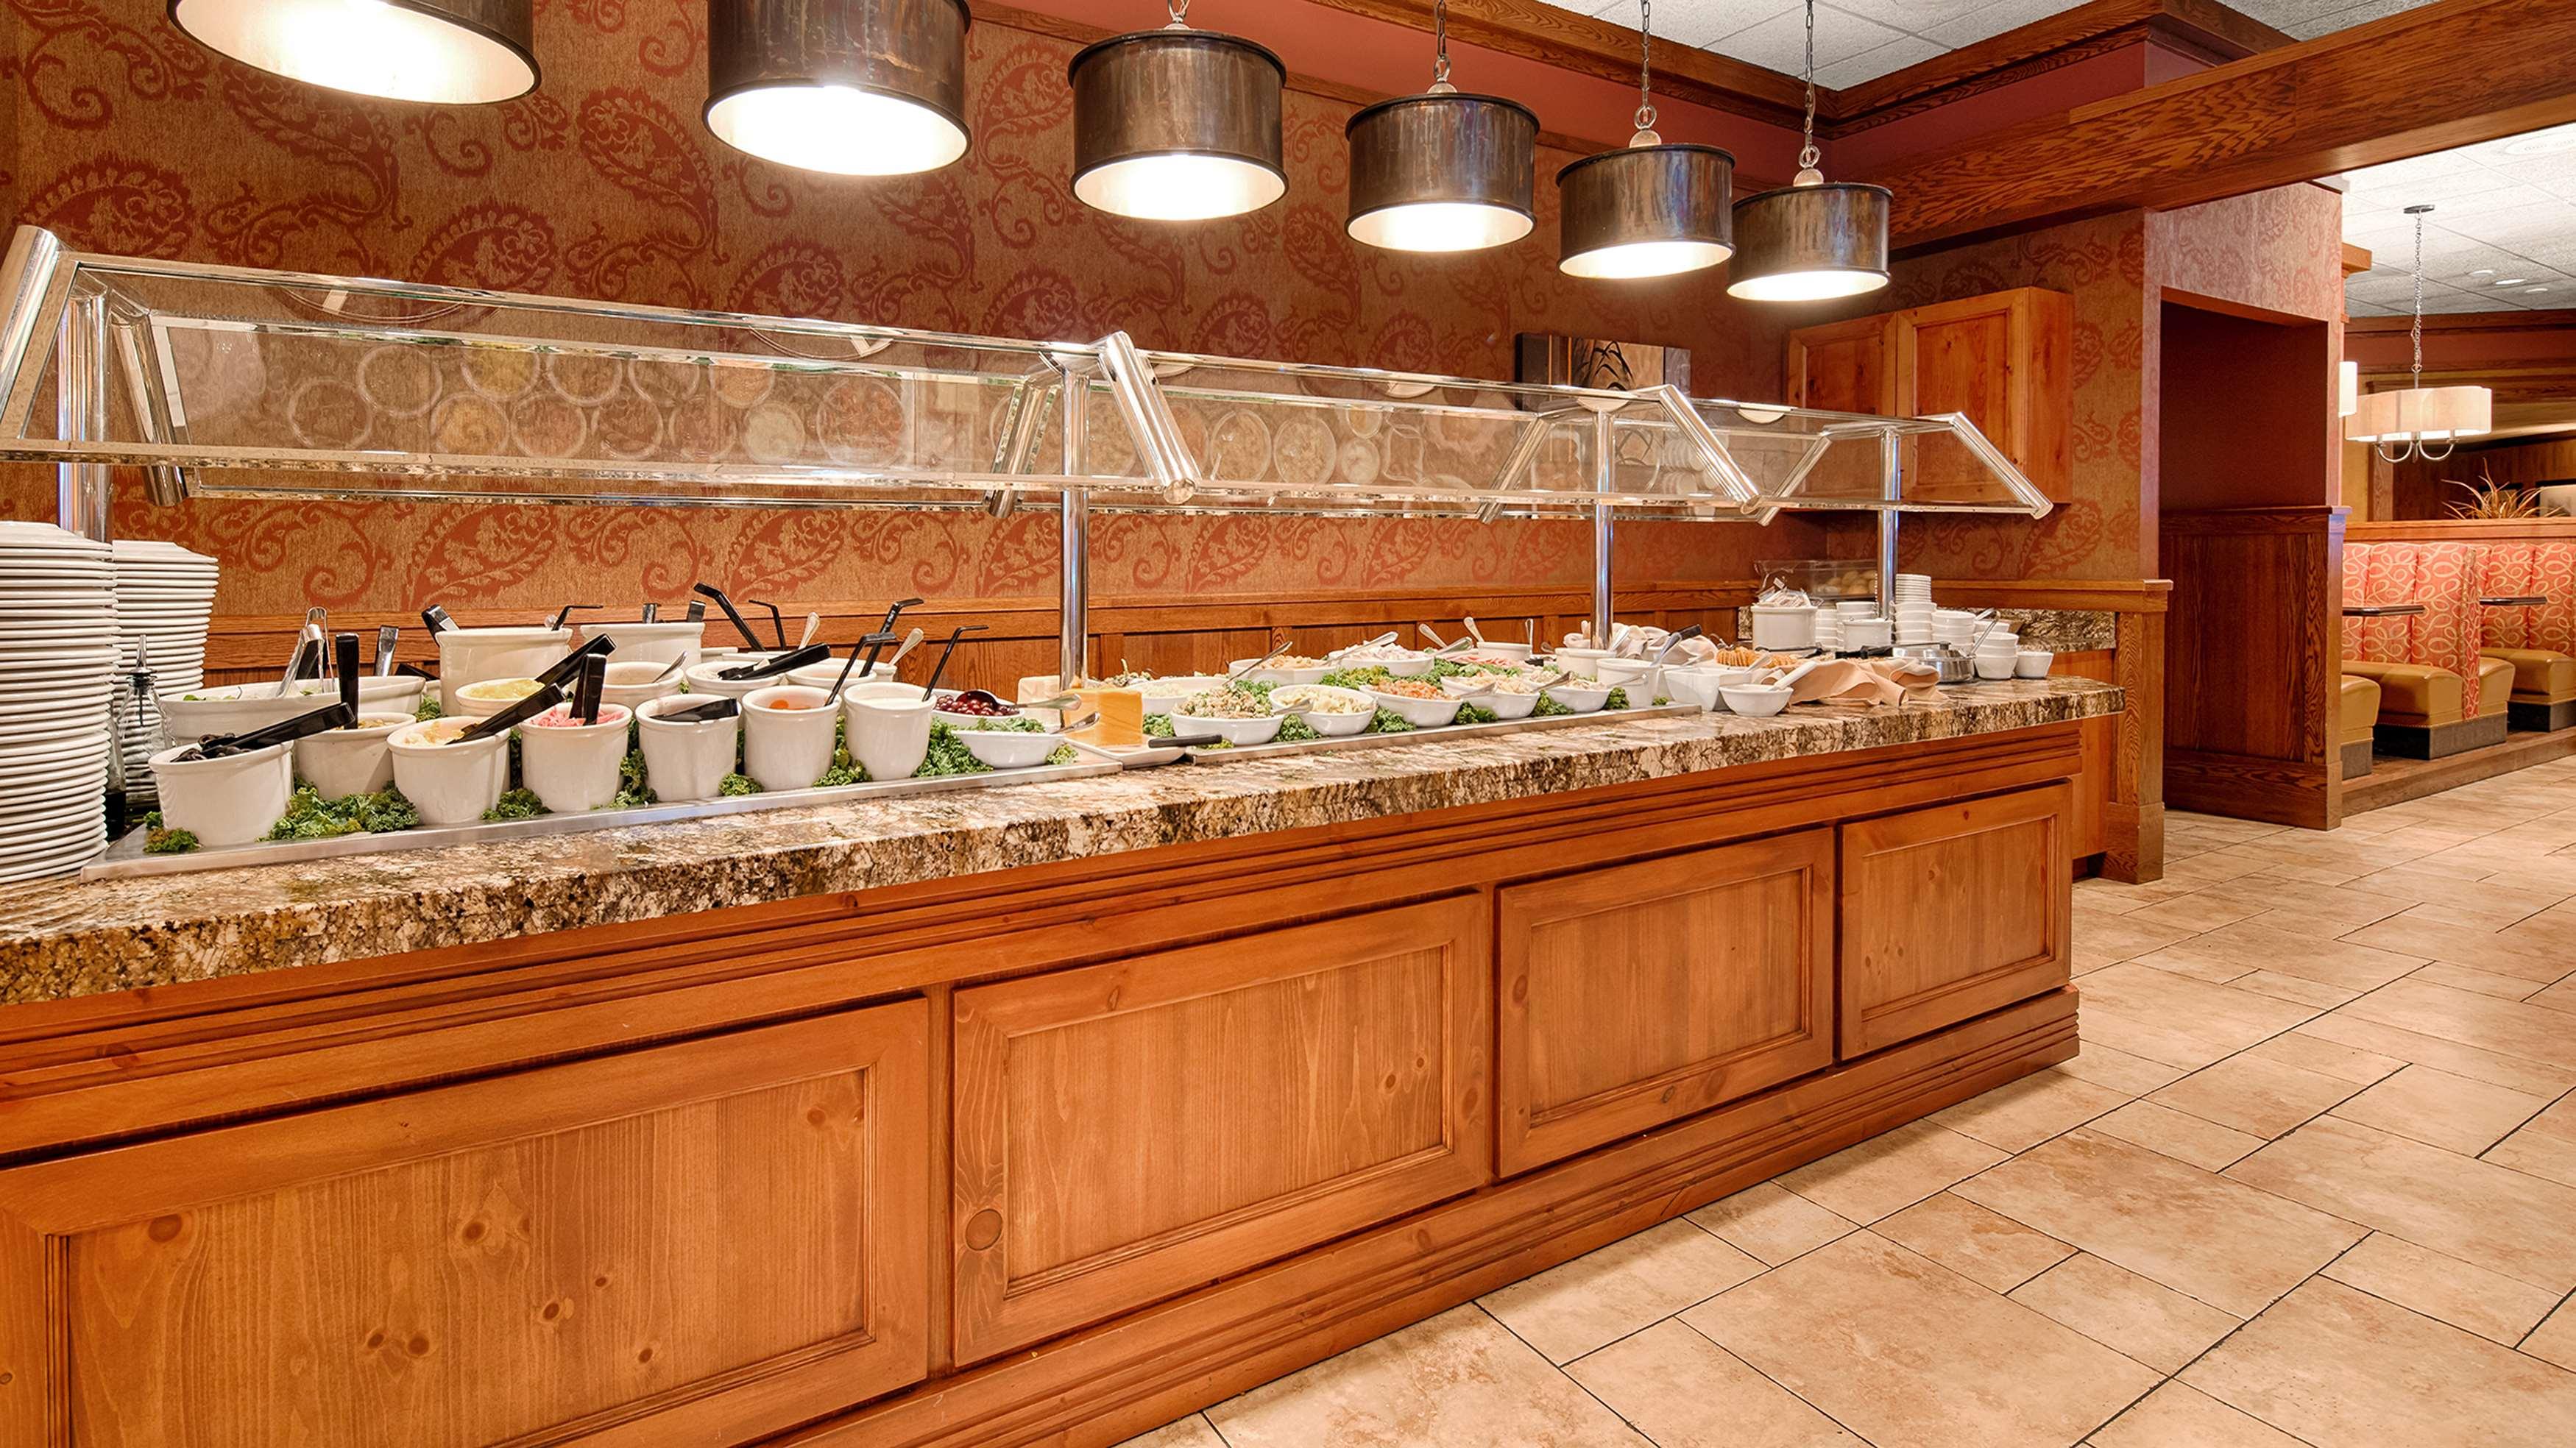 Best Western Ramkota Hotel, Rapid City South Dakota (SD) - LocalDatabase.com